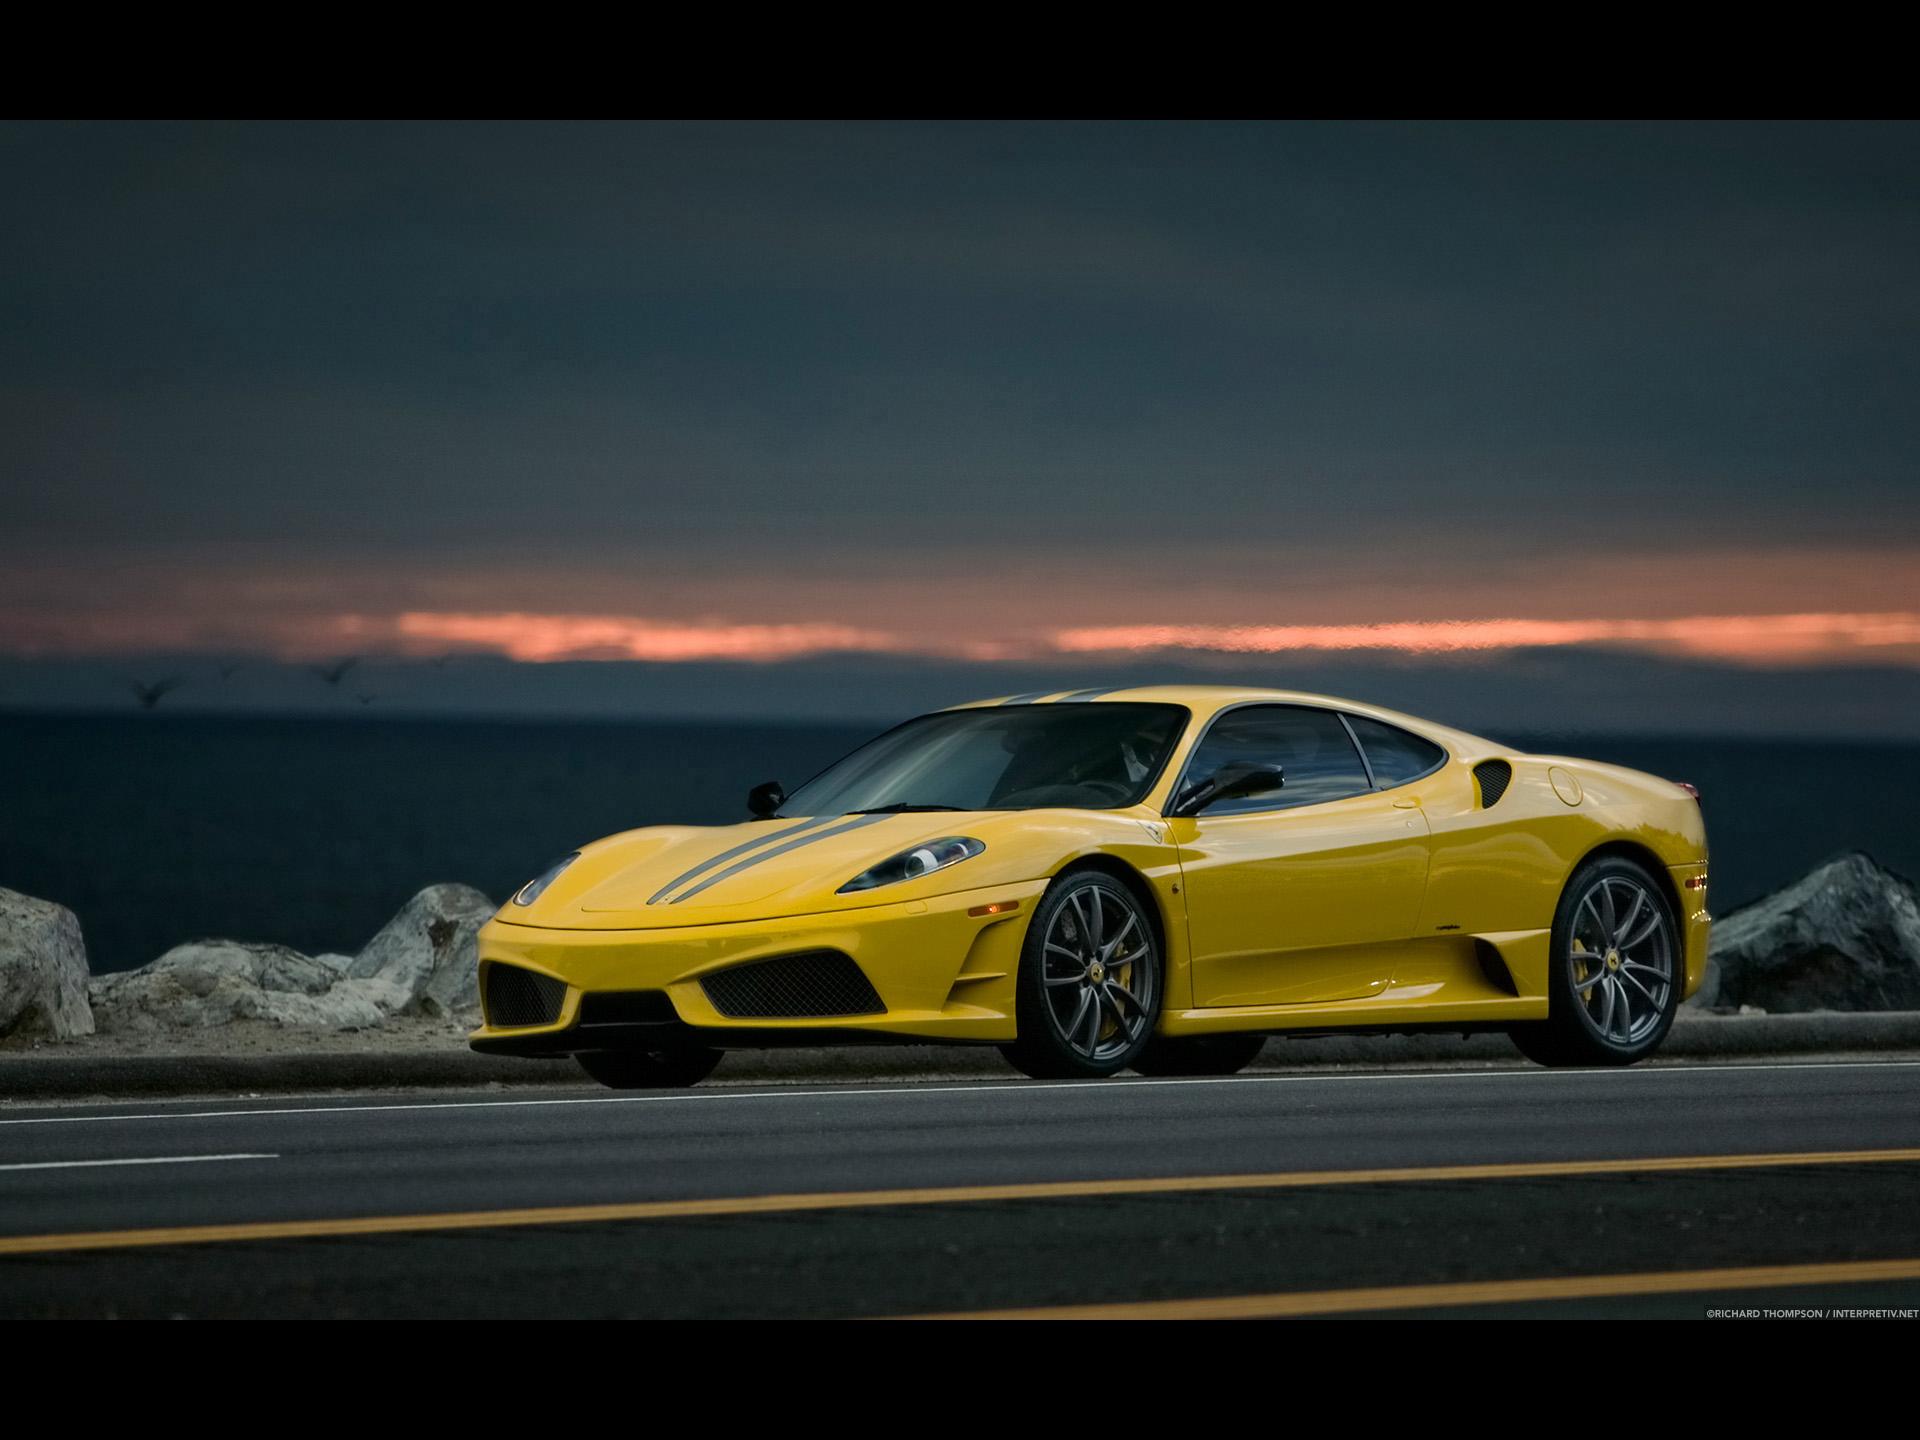 Scuderia Ferrari Wallpaper 4K